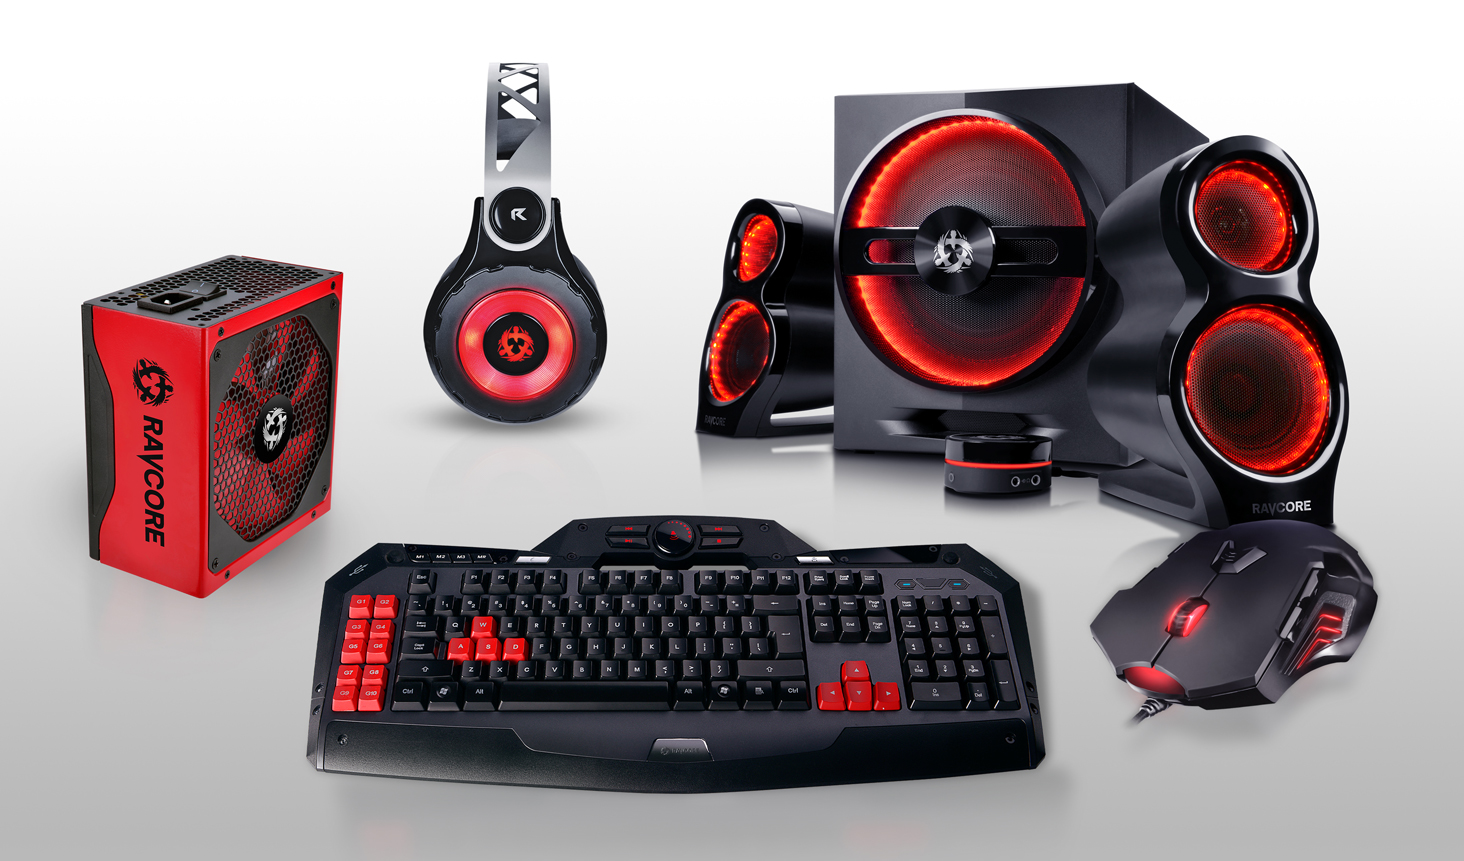 Ravcore – nowa marka gamingowa w Polsce